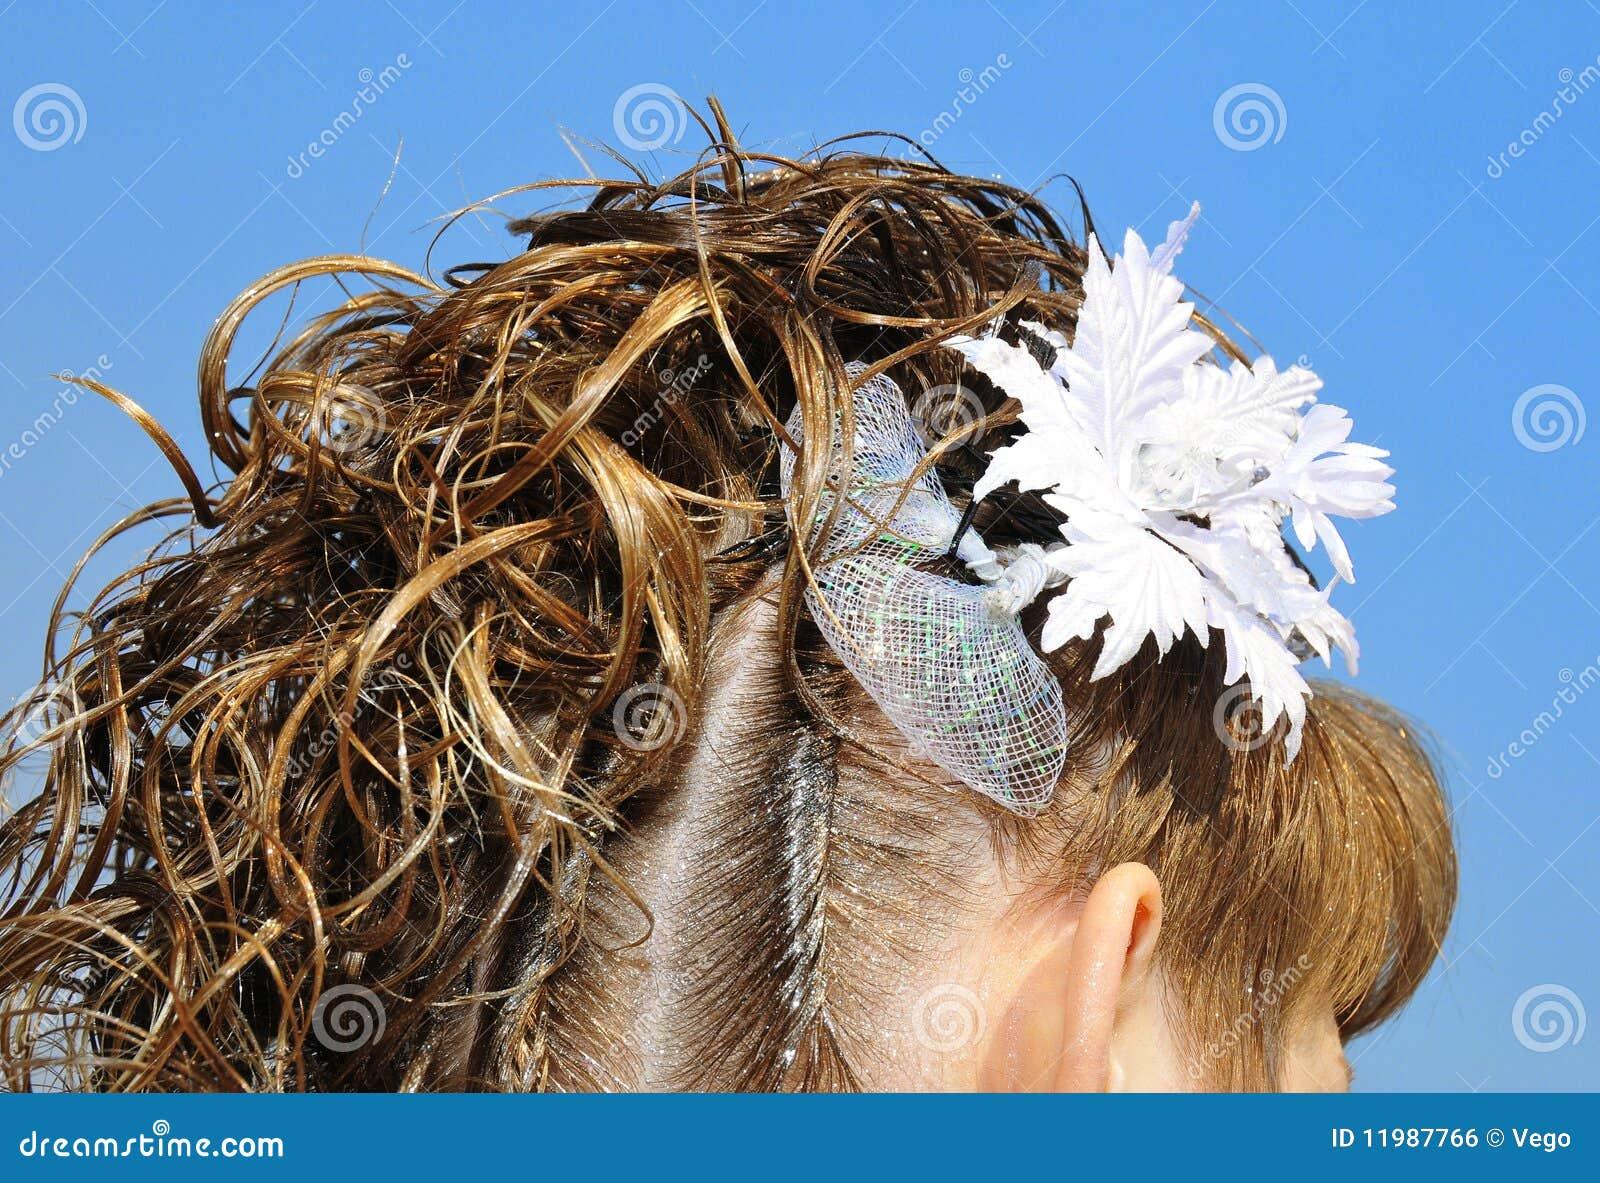 bridal hair design royalty free stock image - image: 11987766